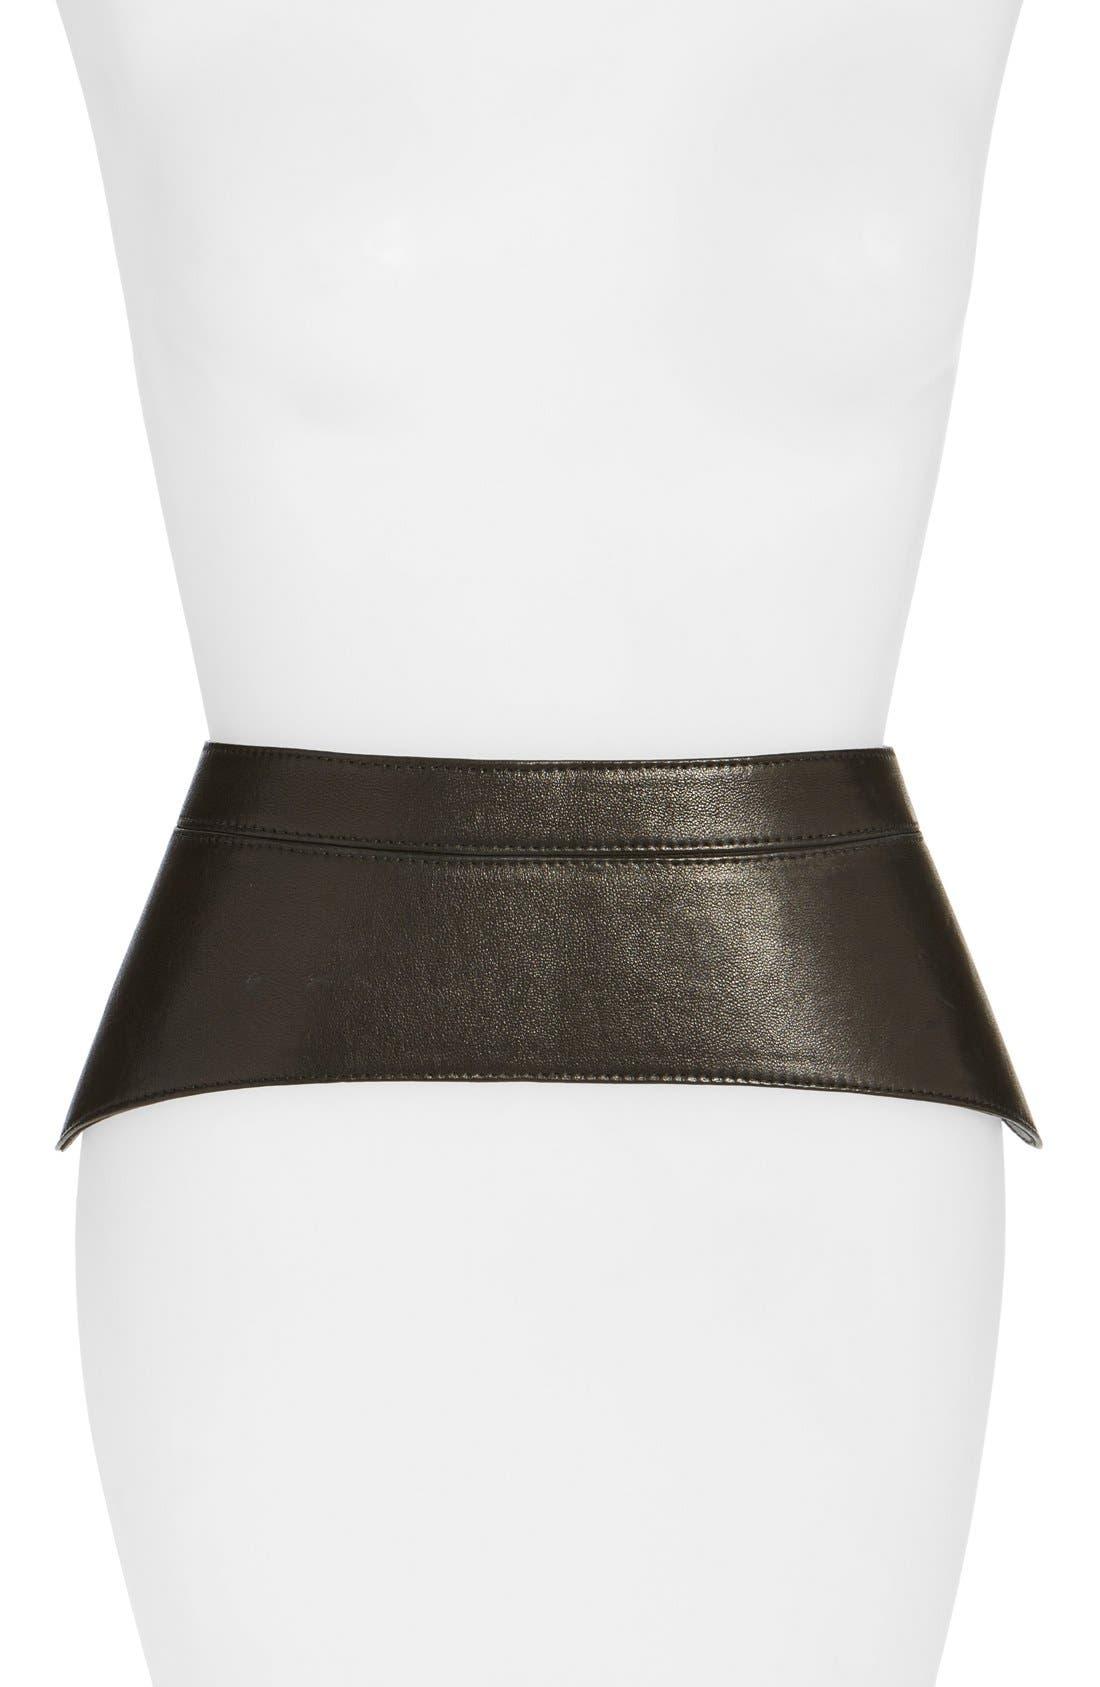 Alternate Image 1 Selected - Raina 'Peplum' Leather Corset Belt